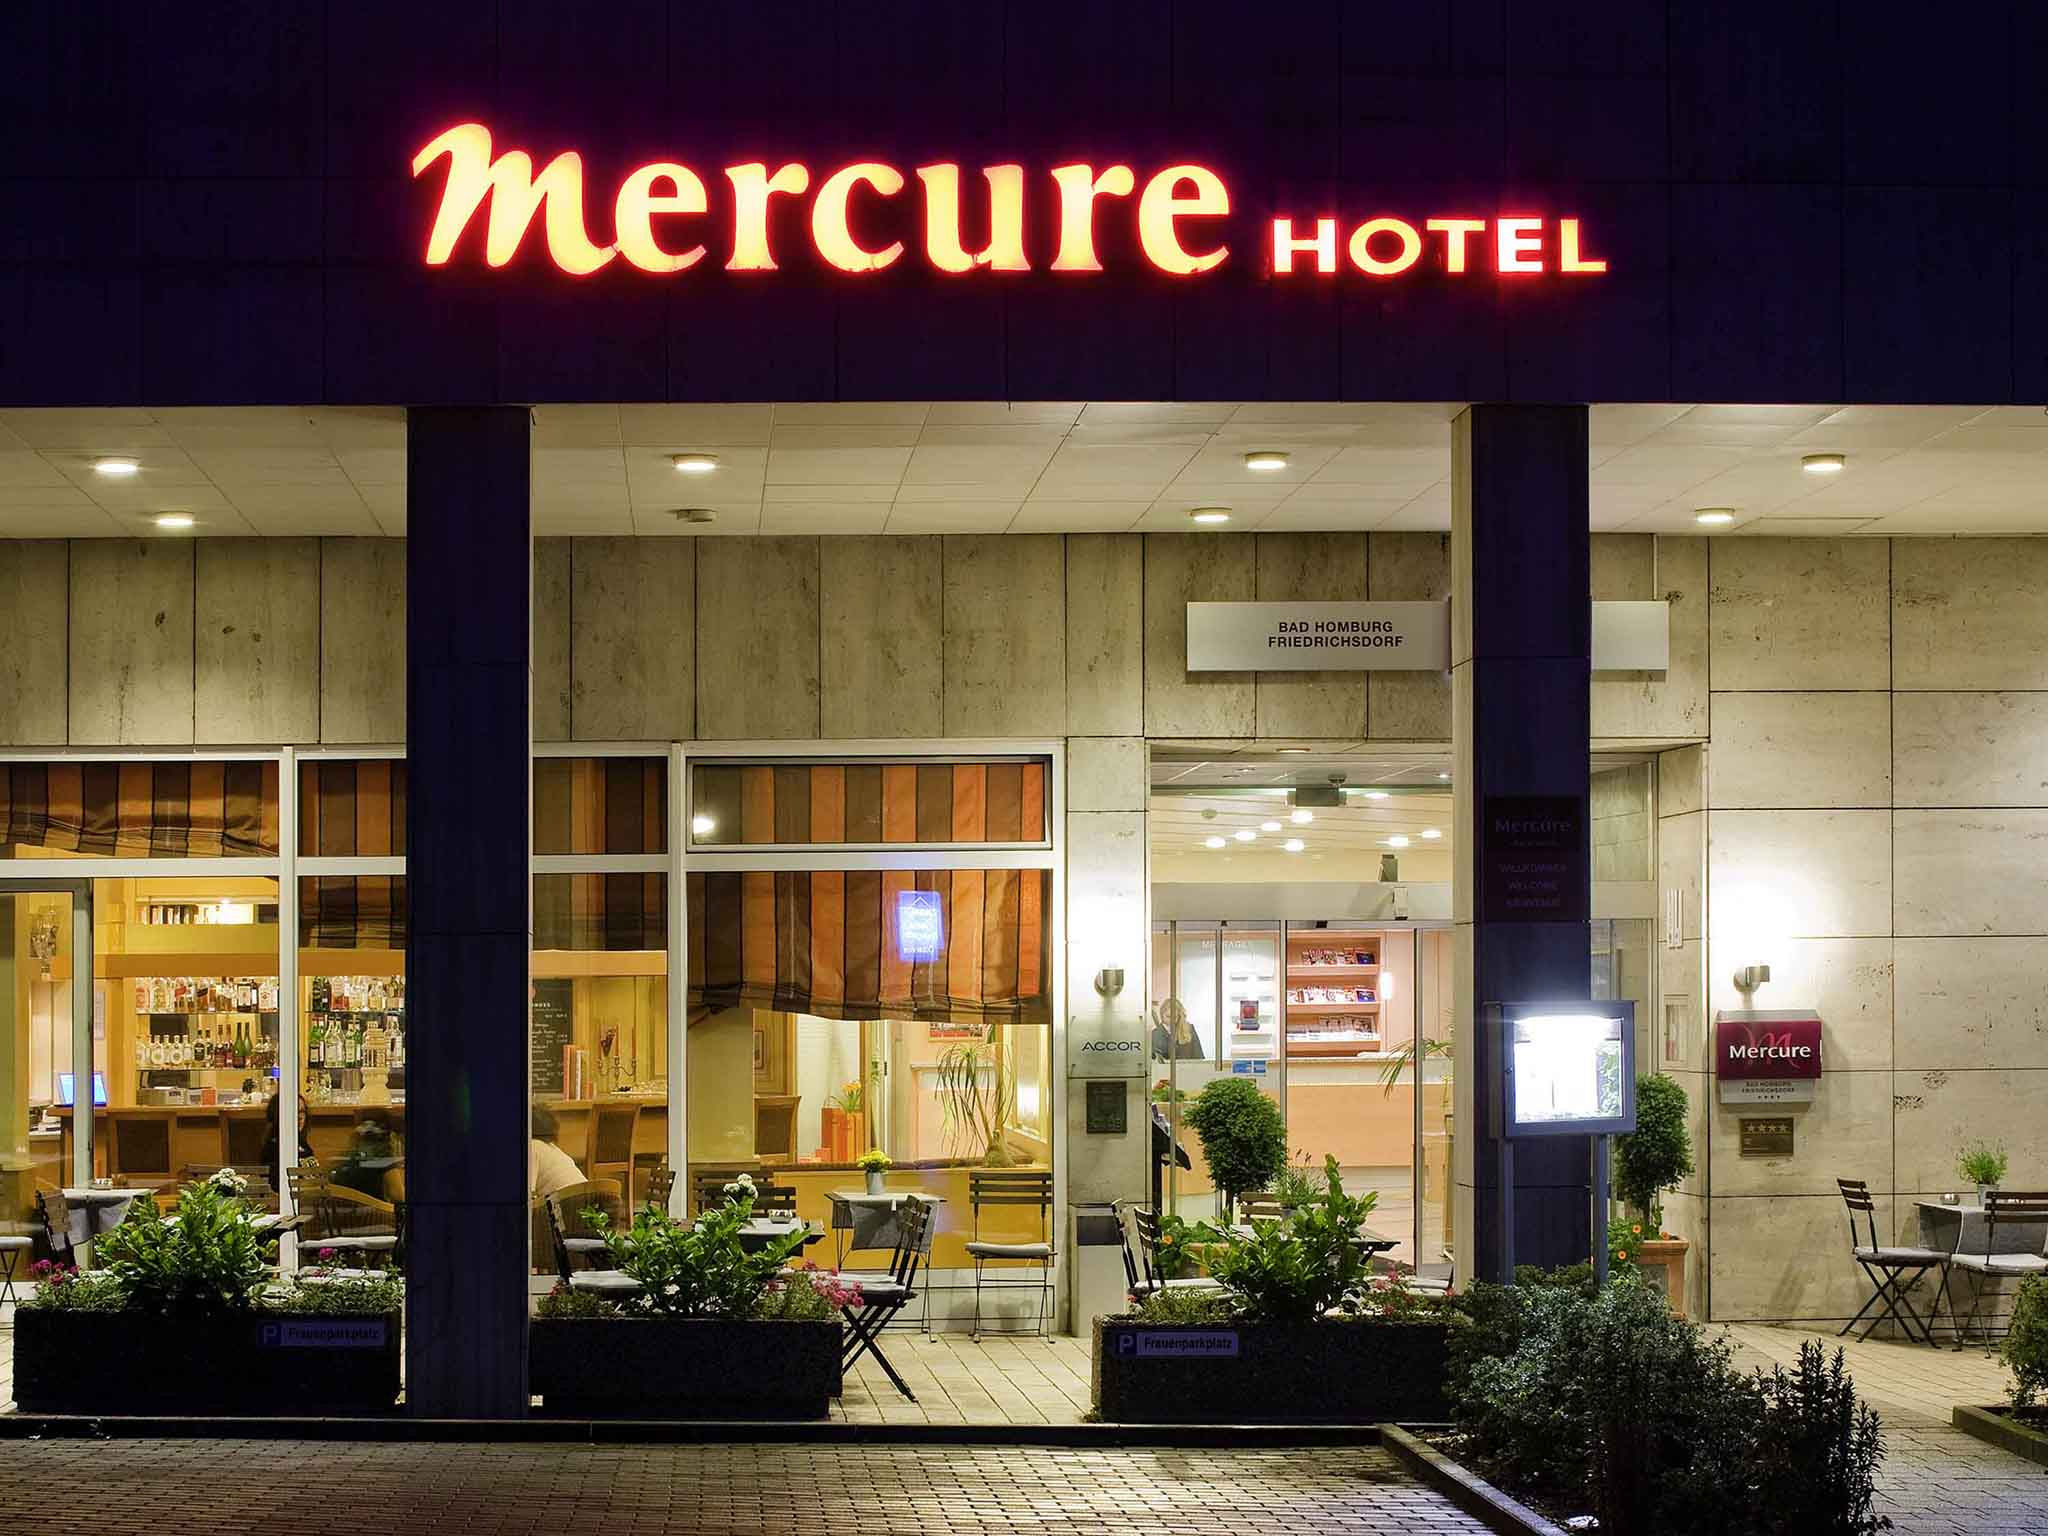 Hôtel - Mercure Hotel Bad Homburg Friedrichsdorf